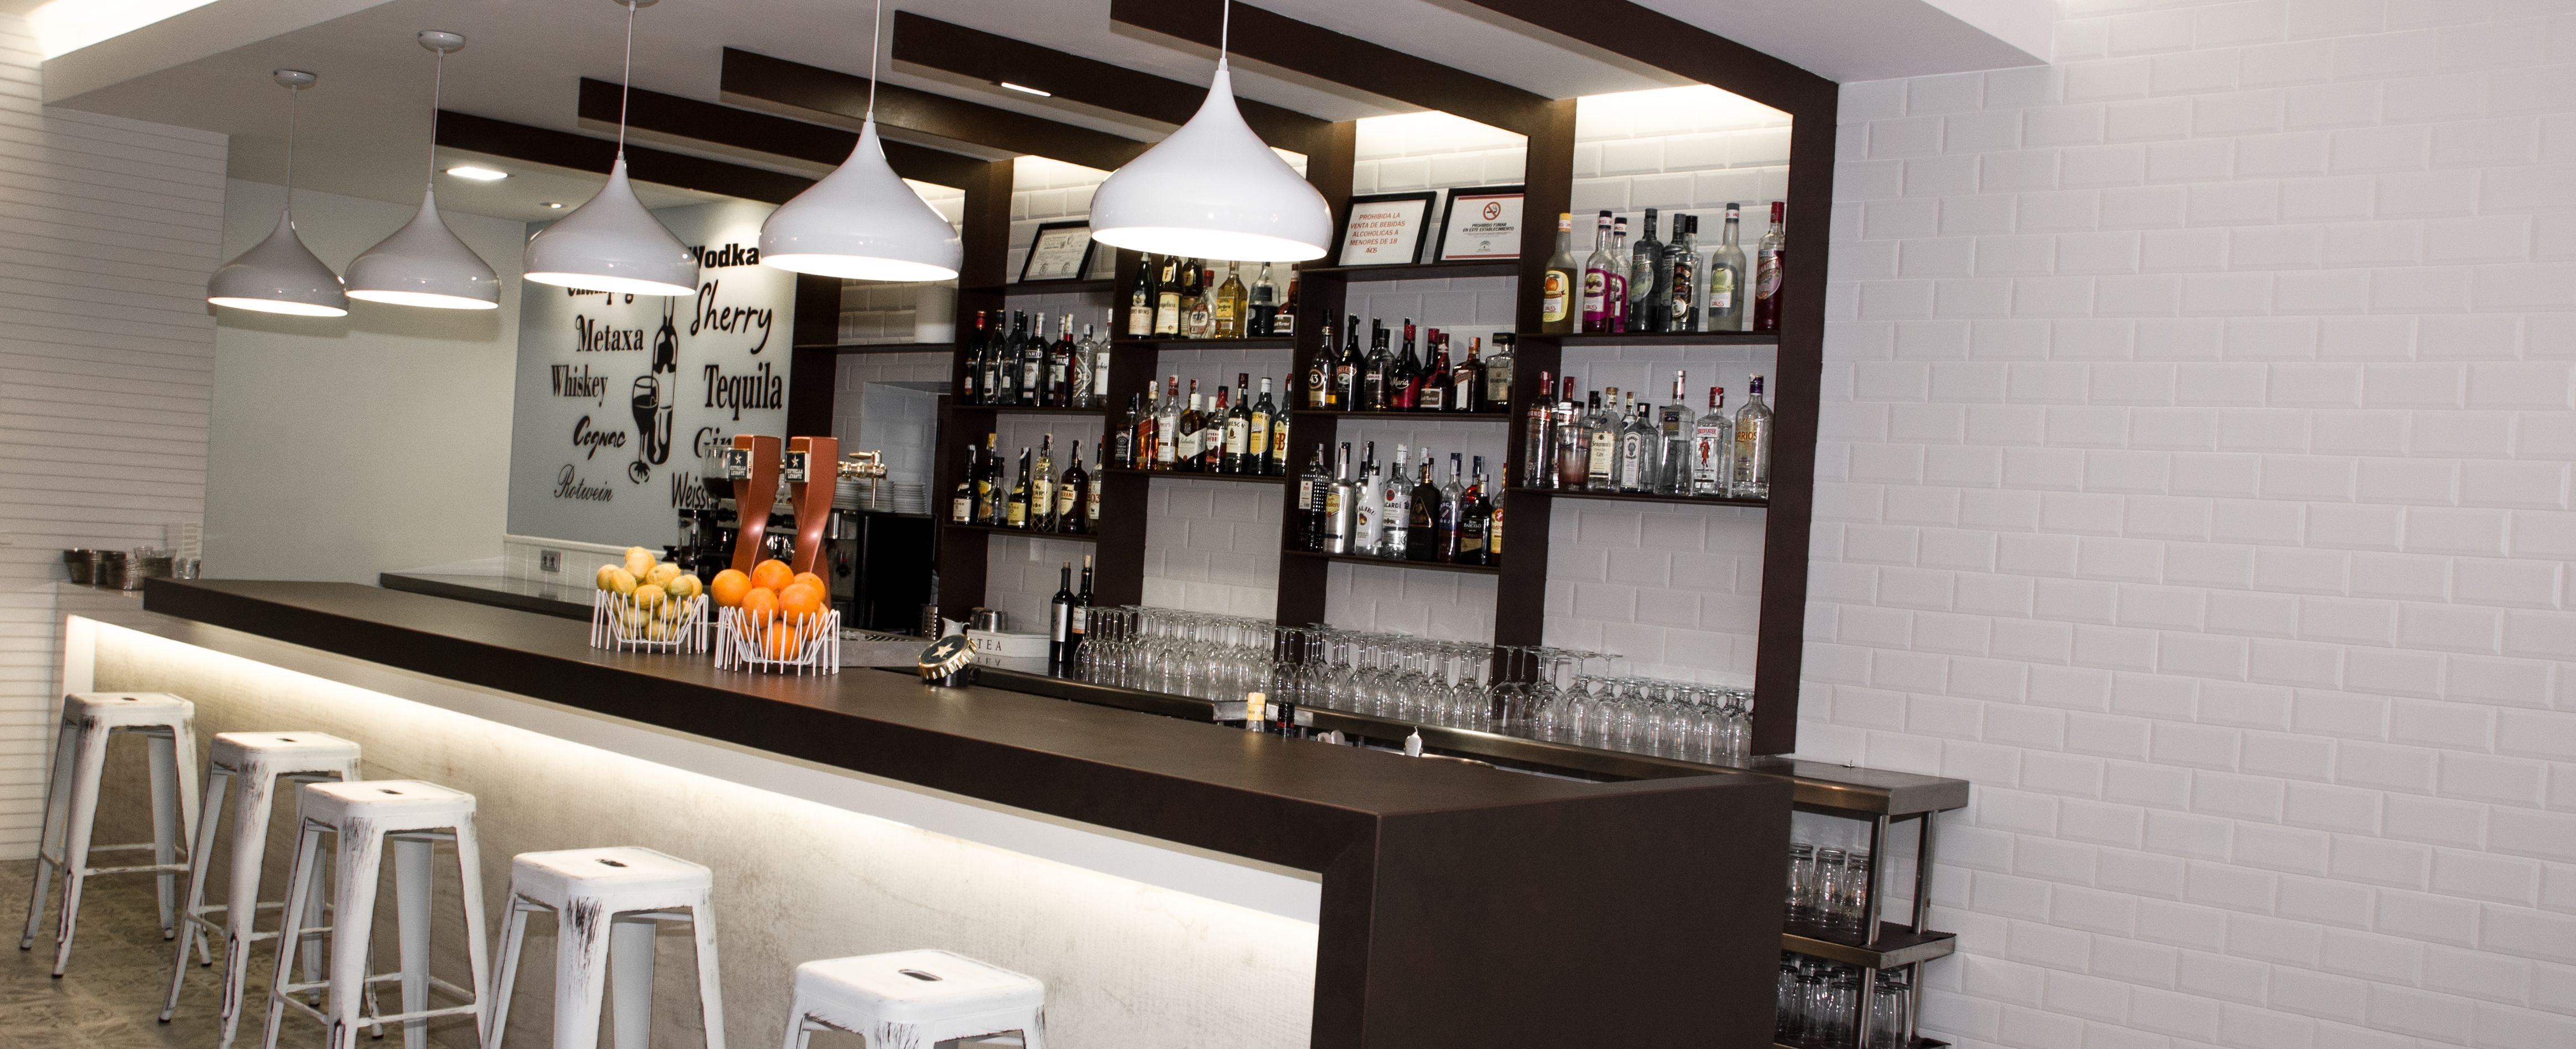 Detalle barra diseño by CARMAN Interiorismo. #carmaninteriorismo, #proyecto, #diseño, #interiorismo, #restaurante, #mojacar